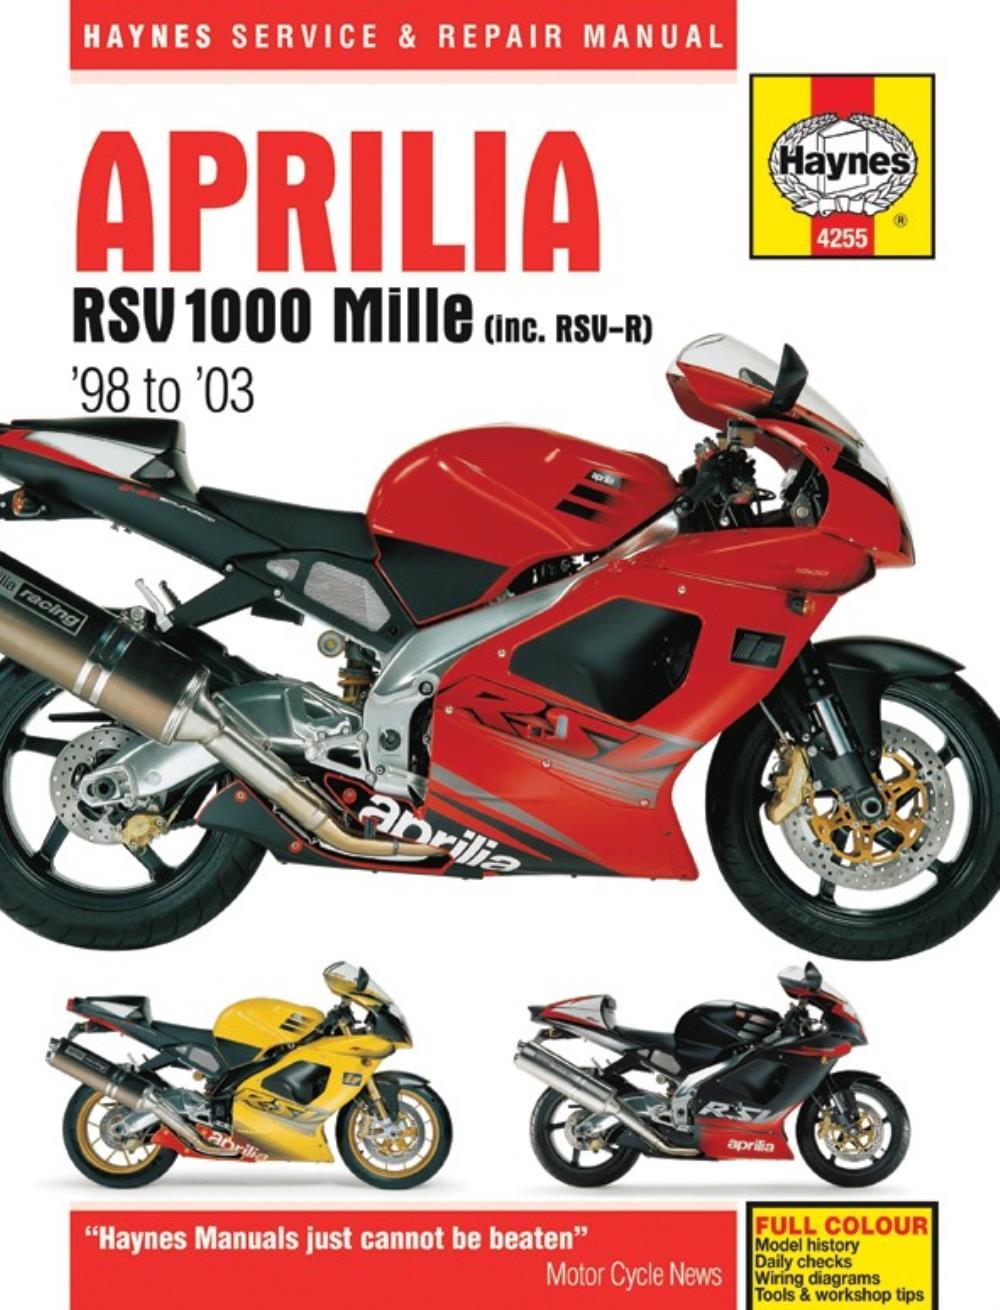 Image is loading Manual-Haynes-for-2002-Aprilia-RSV-1000-R-